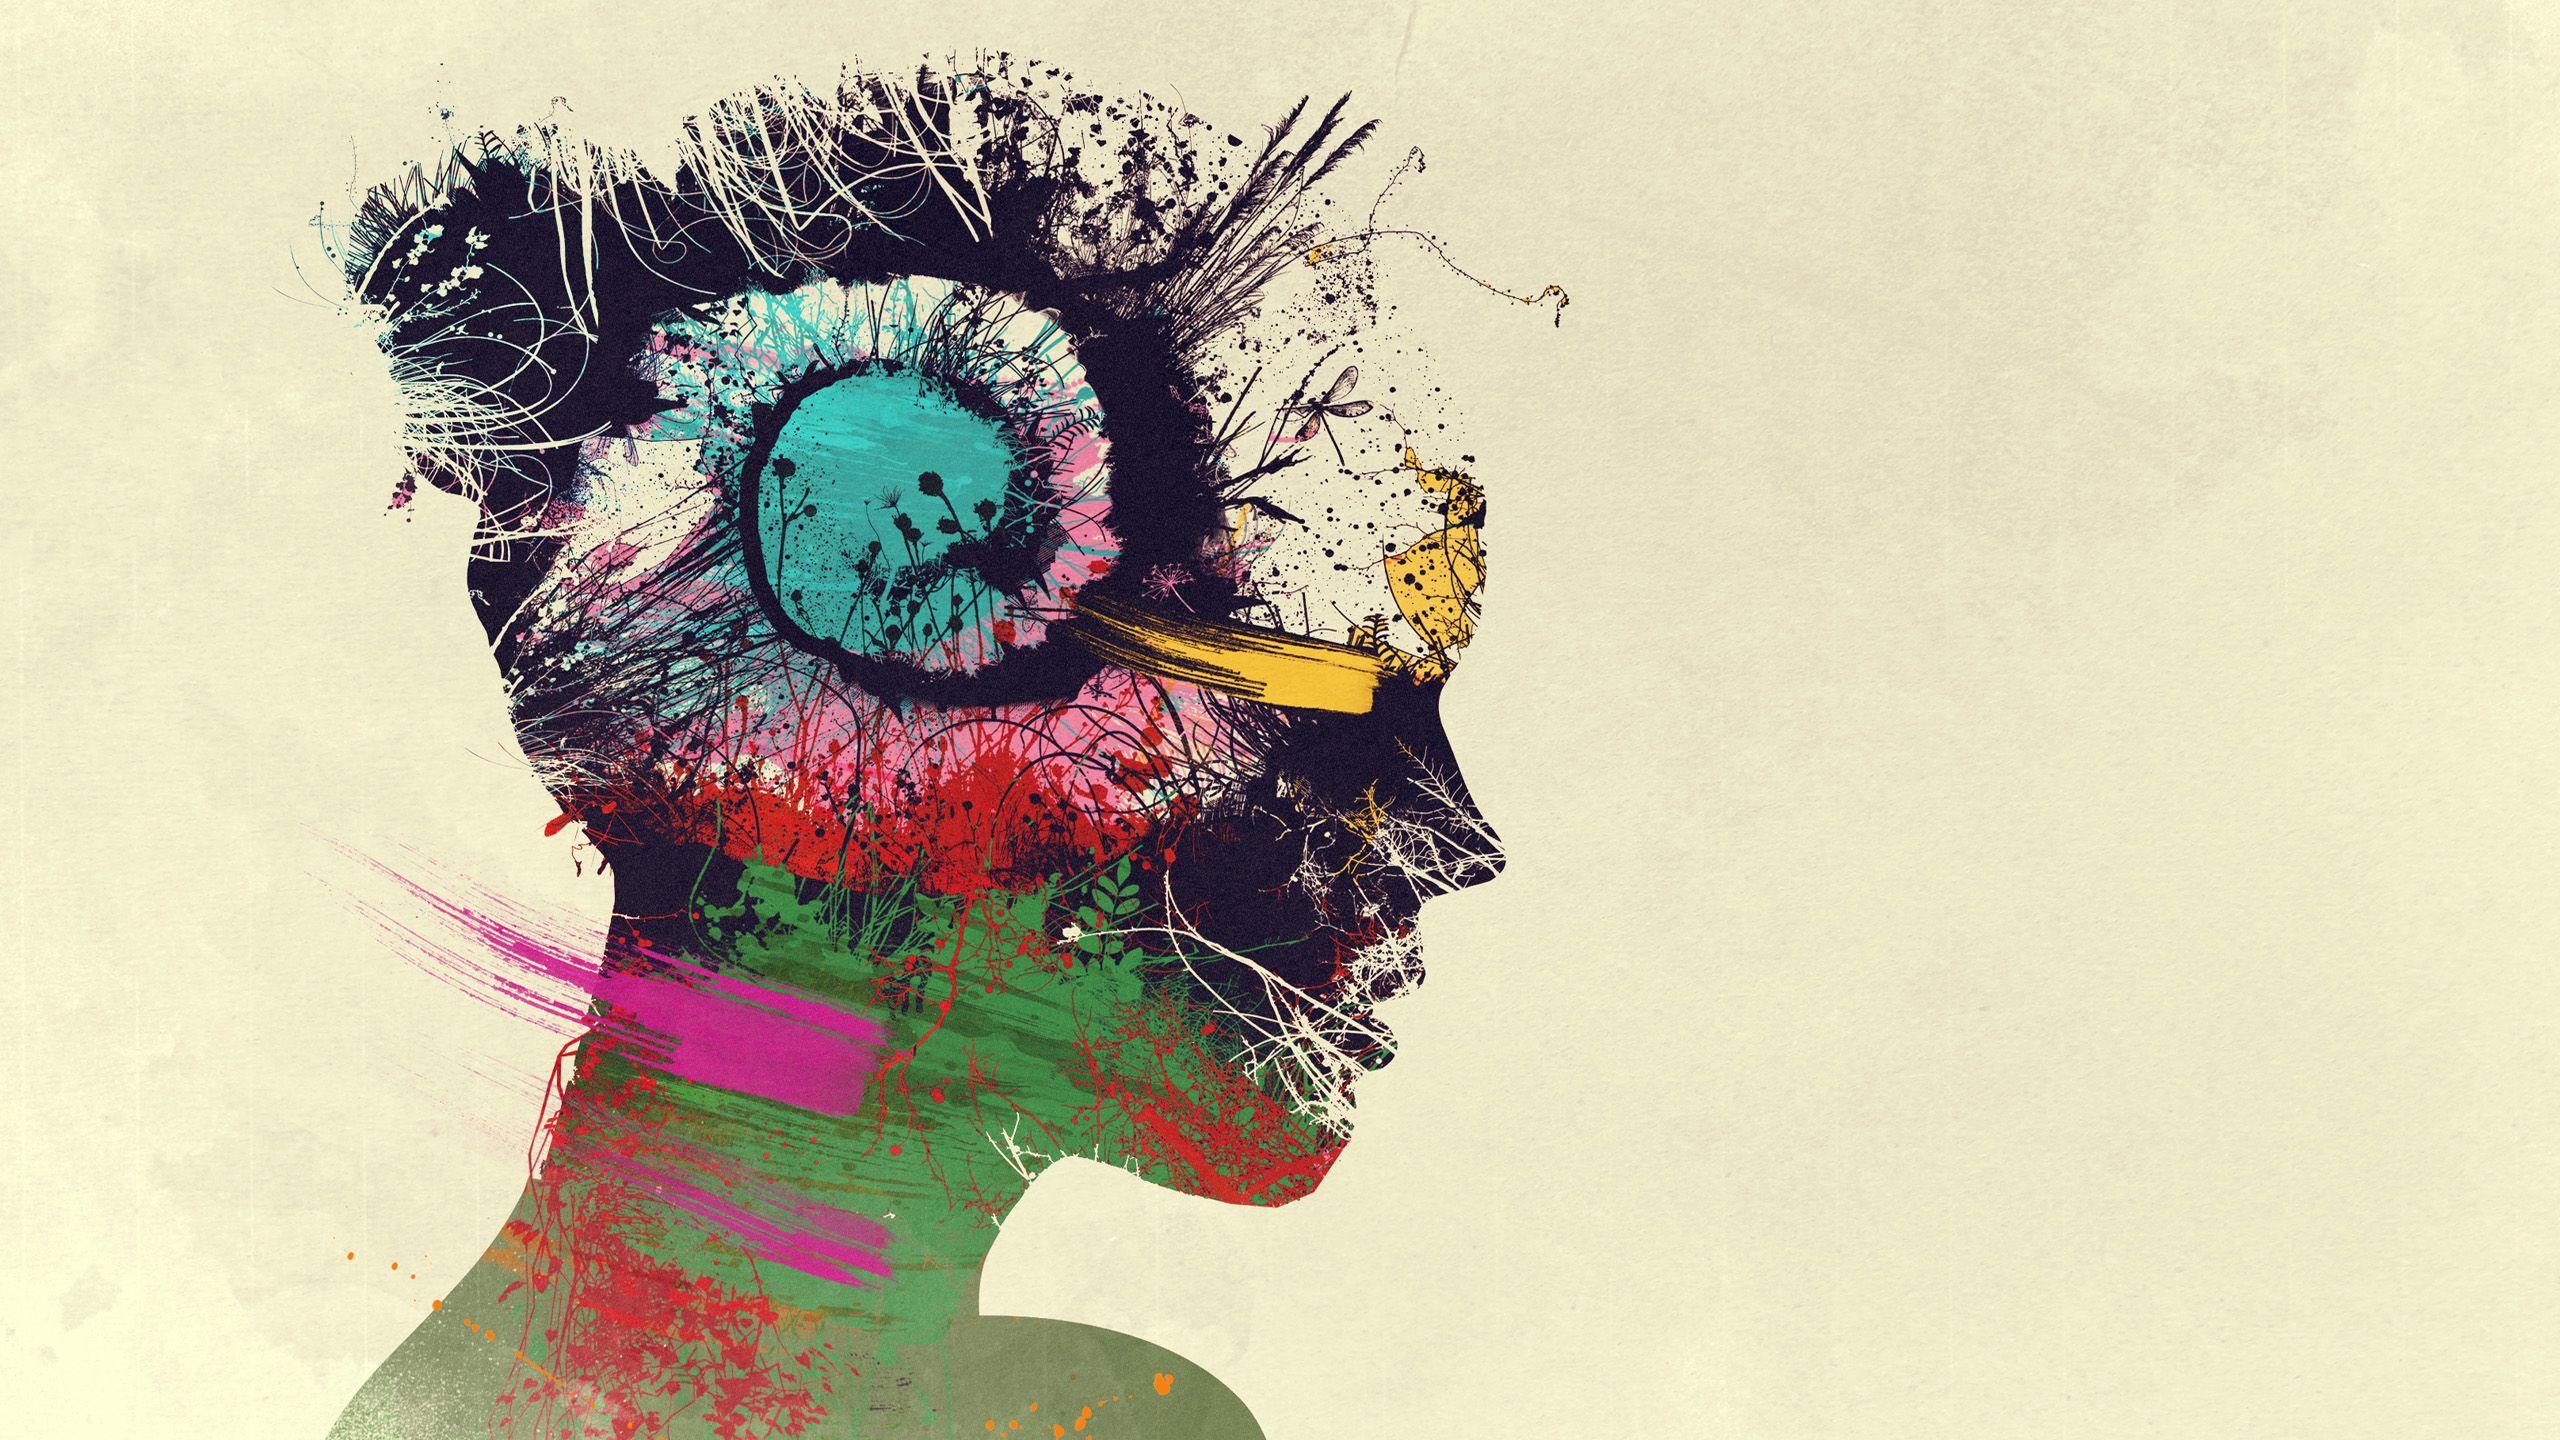 psychedelic wallpaper 4k